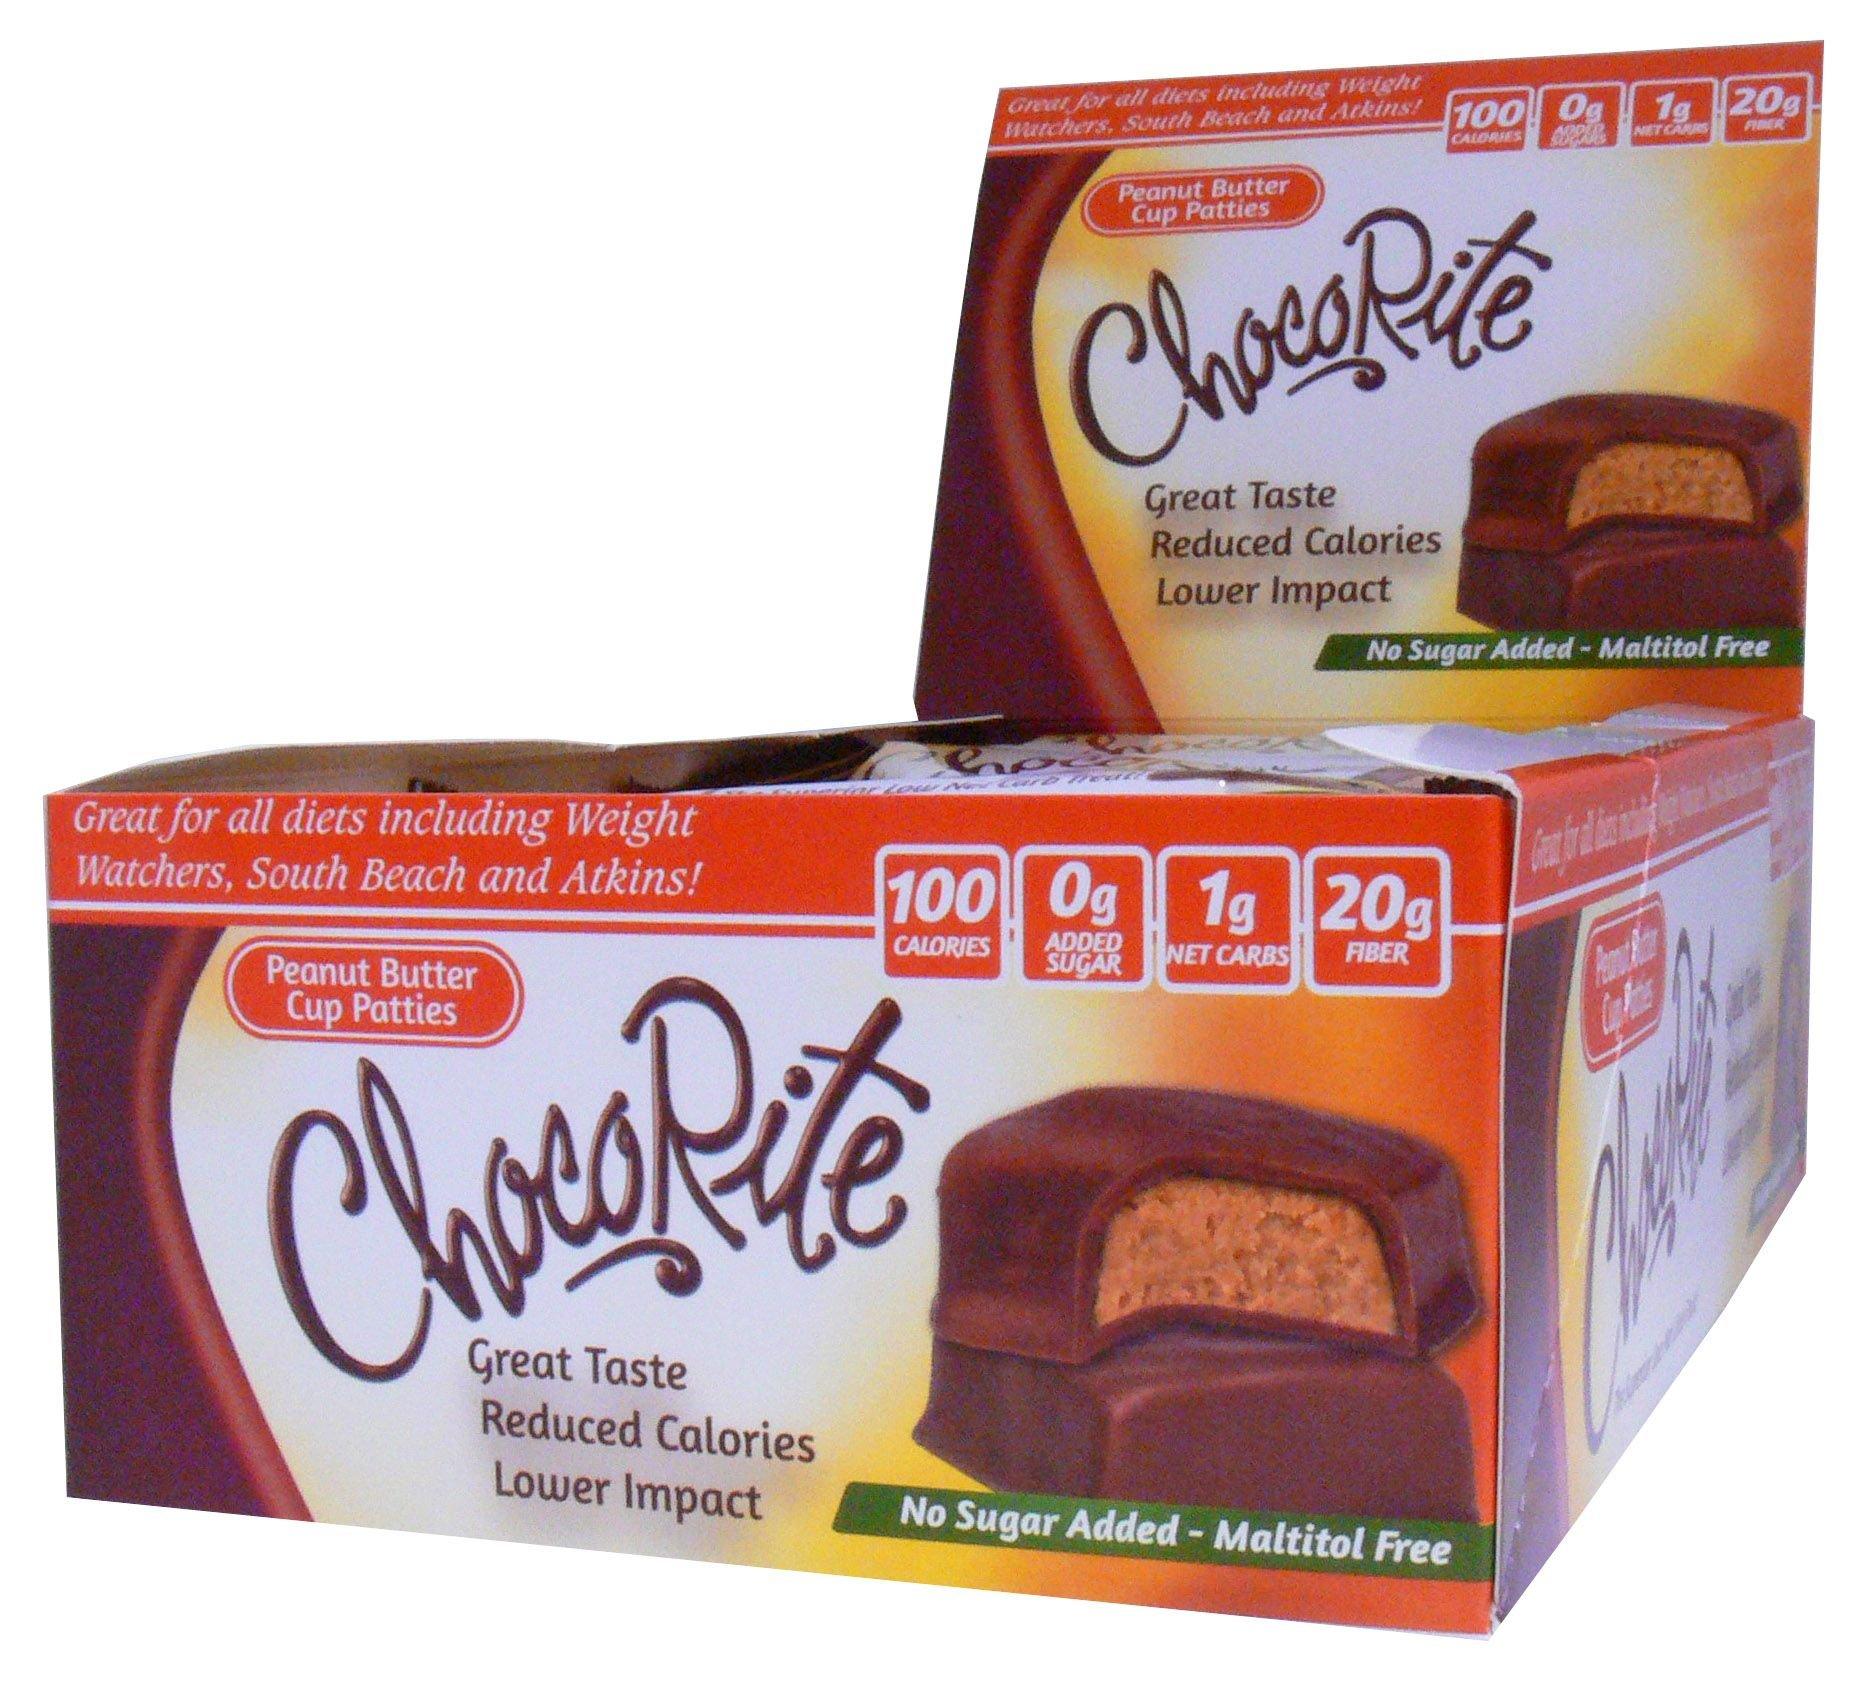 ChocoRite ChocoRite Peanut Butter Cup Patties, Peanut Butter Cup Patties, 18 Ounce , 16 count by ChocoRite